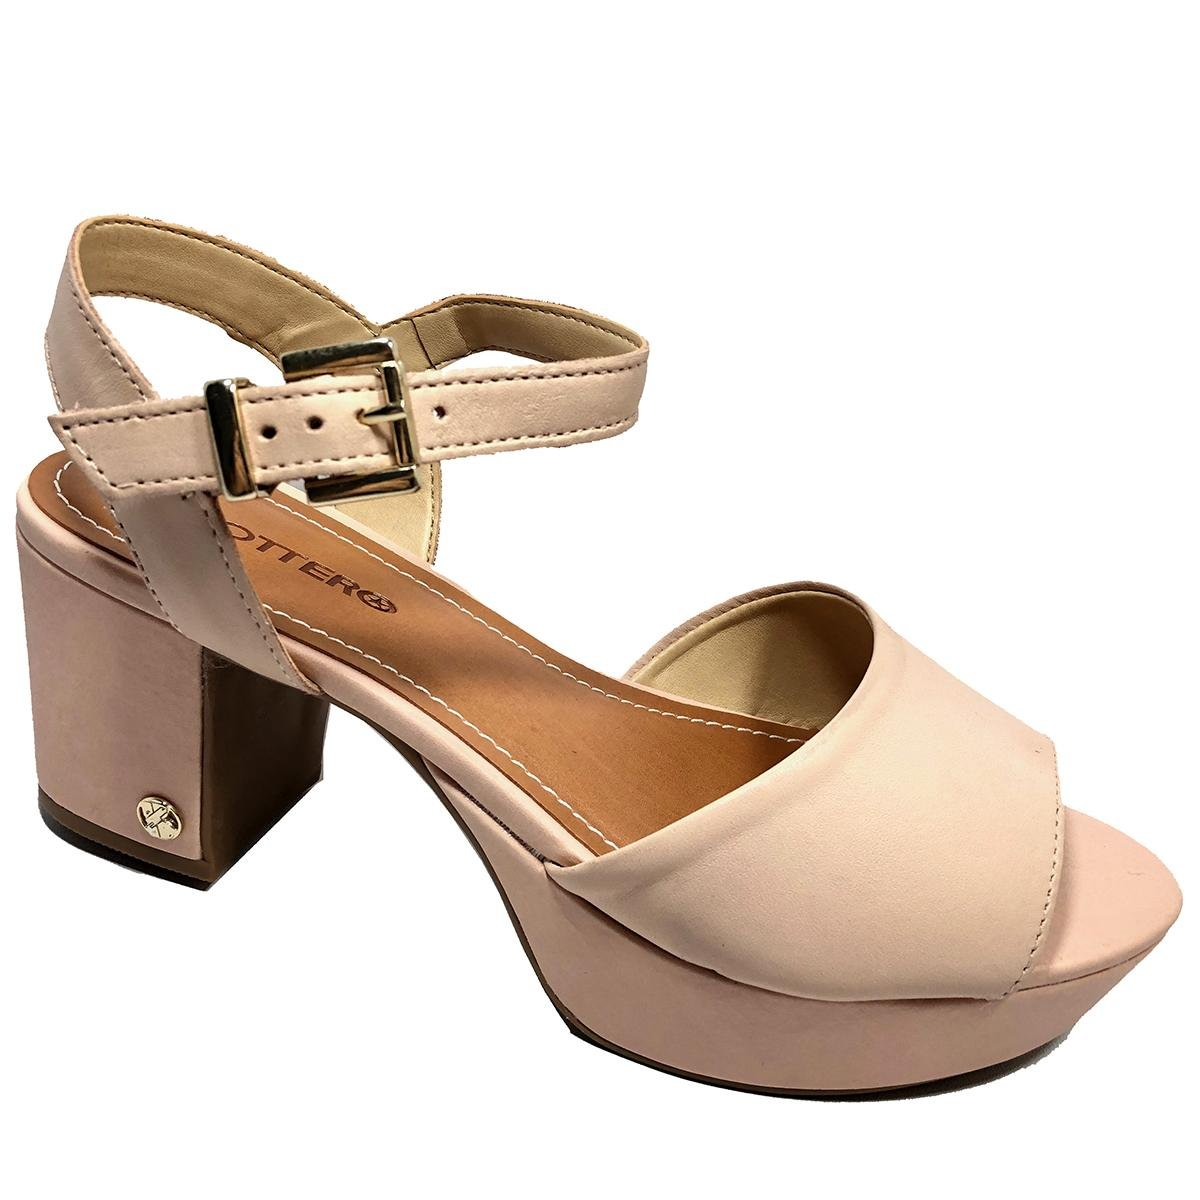 2019 New Arrival Princess Boots  Shoes For Barbie Dolls Heels Sandals shoes